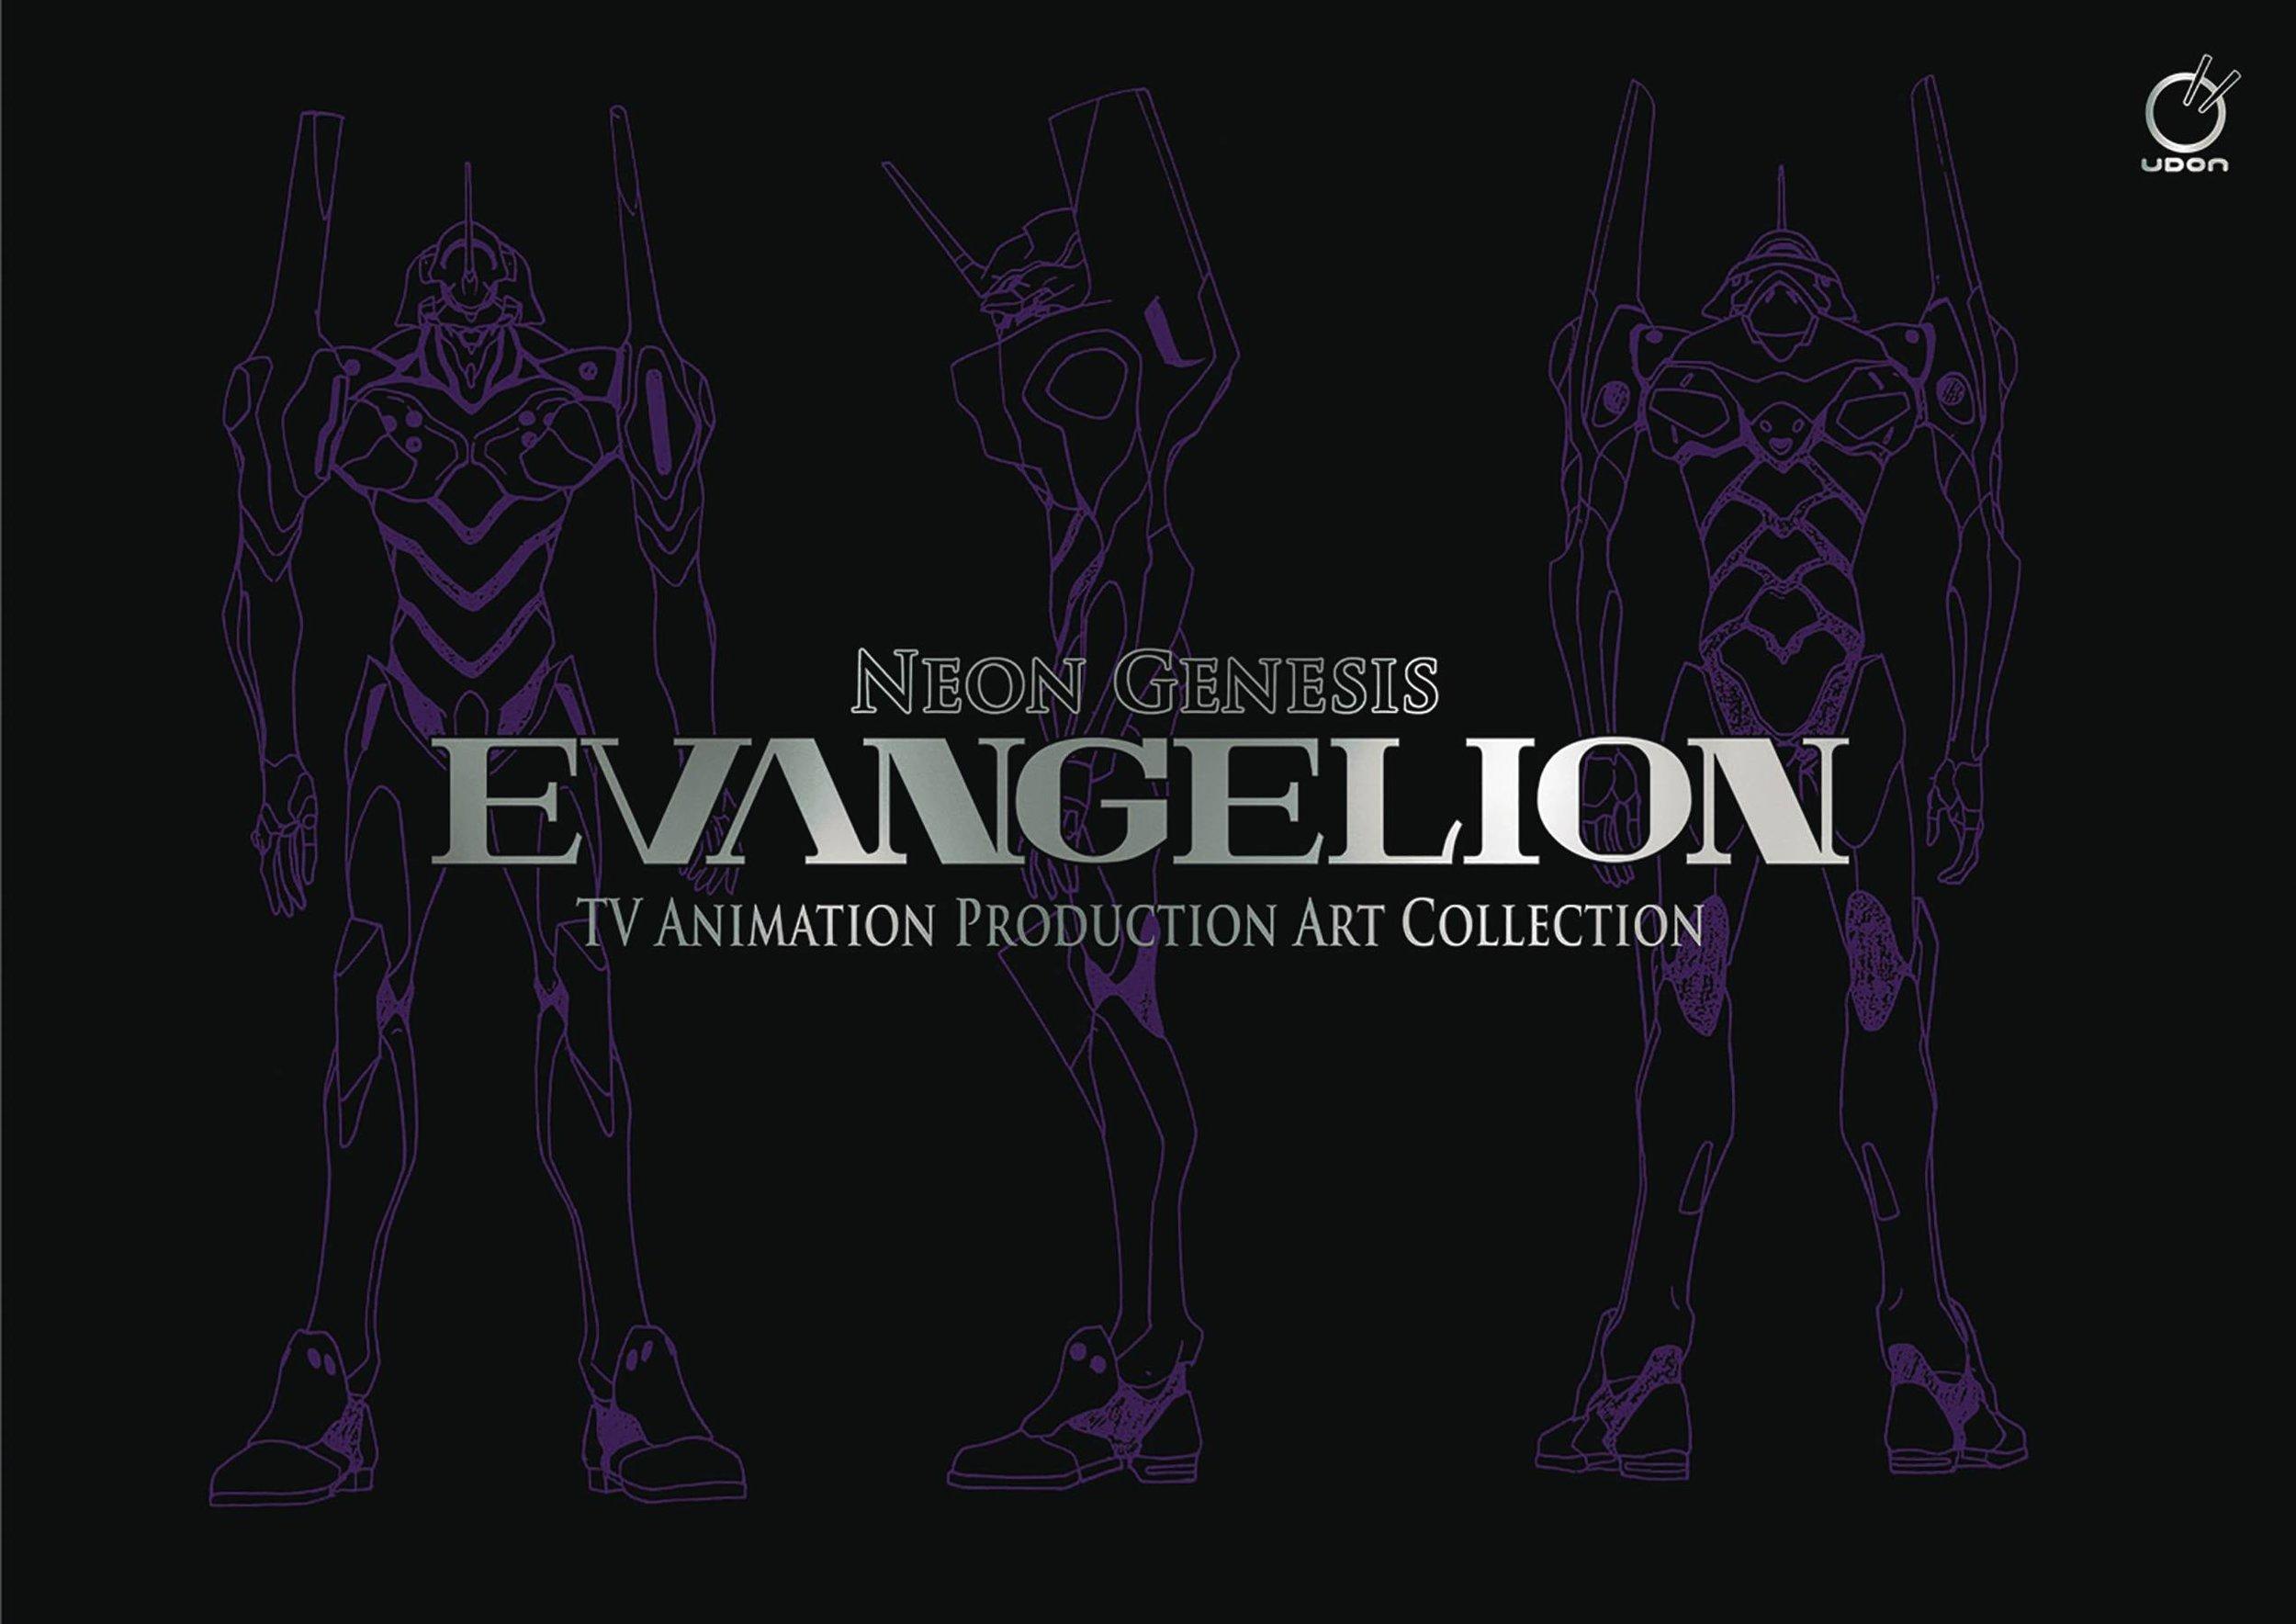 NEON GENESIS EVANGELION HC TV ANIMATION PRODUCTION ART COLL